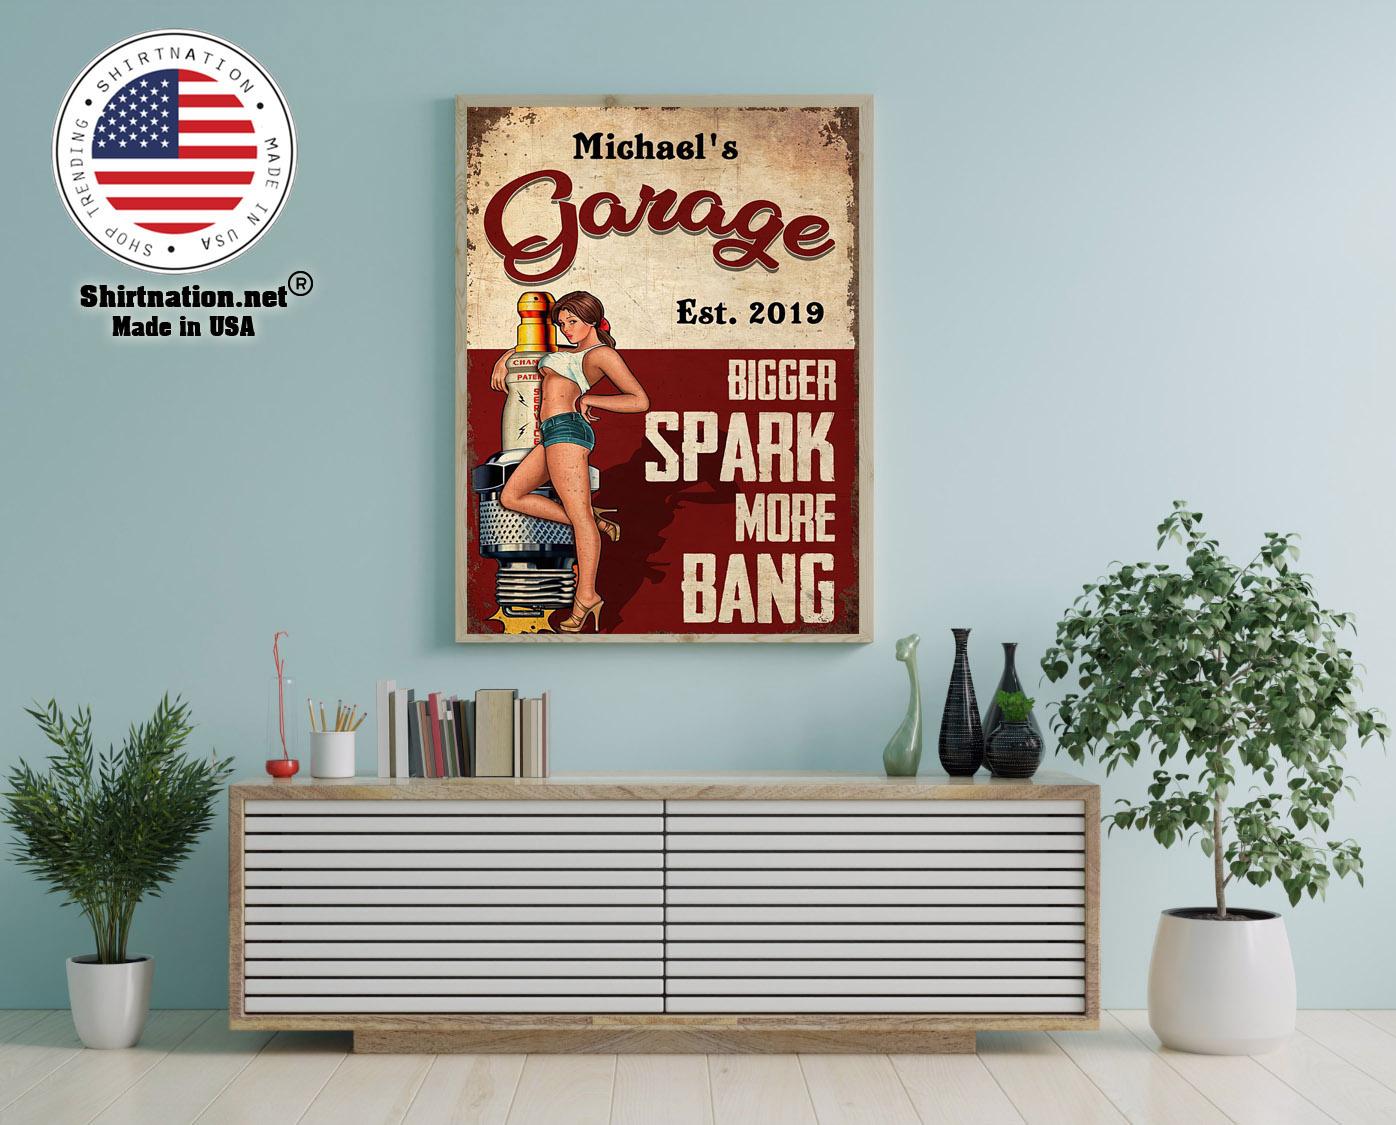 Garage bigger spark more bang poster 12